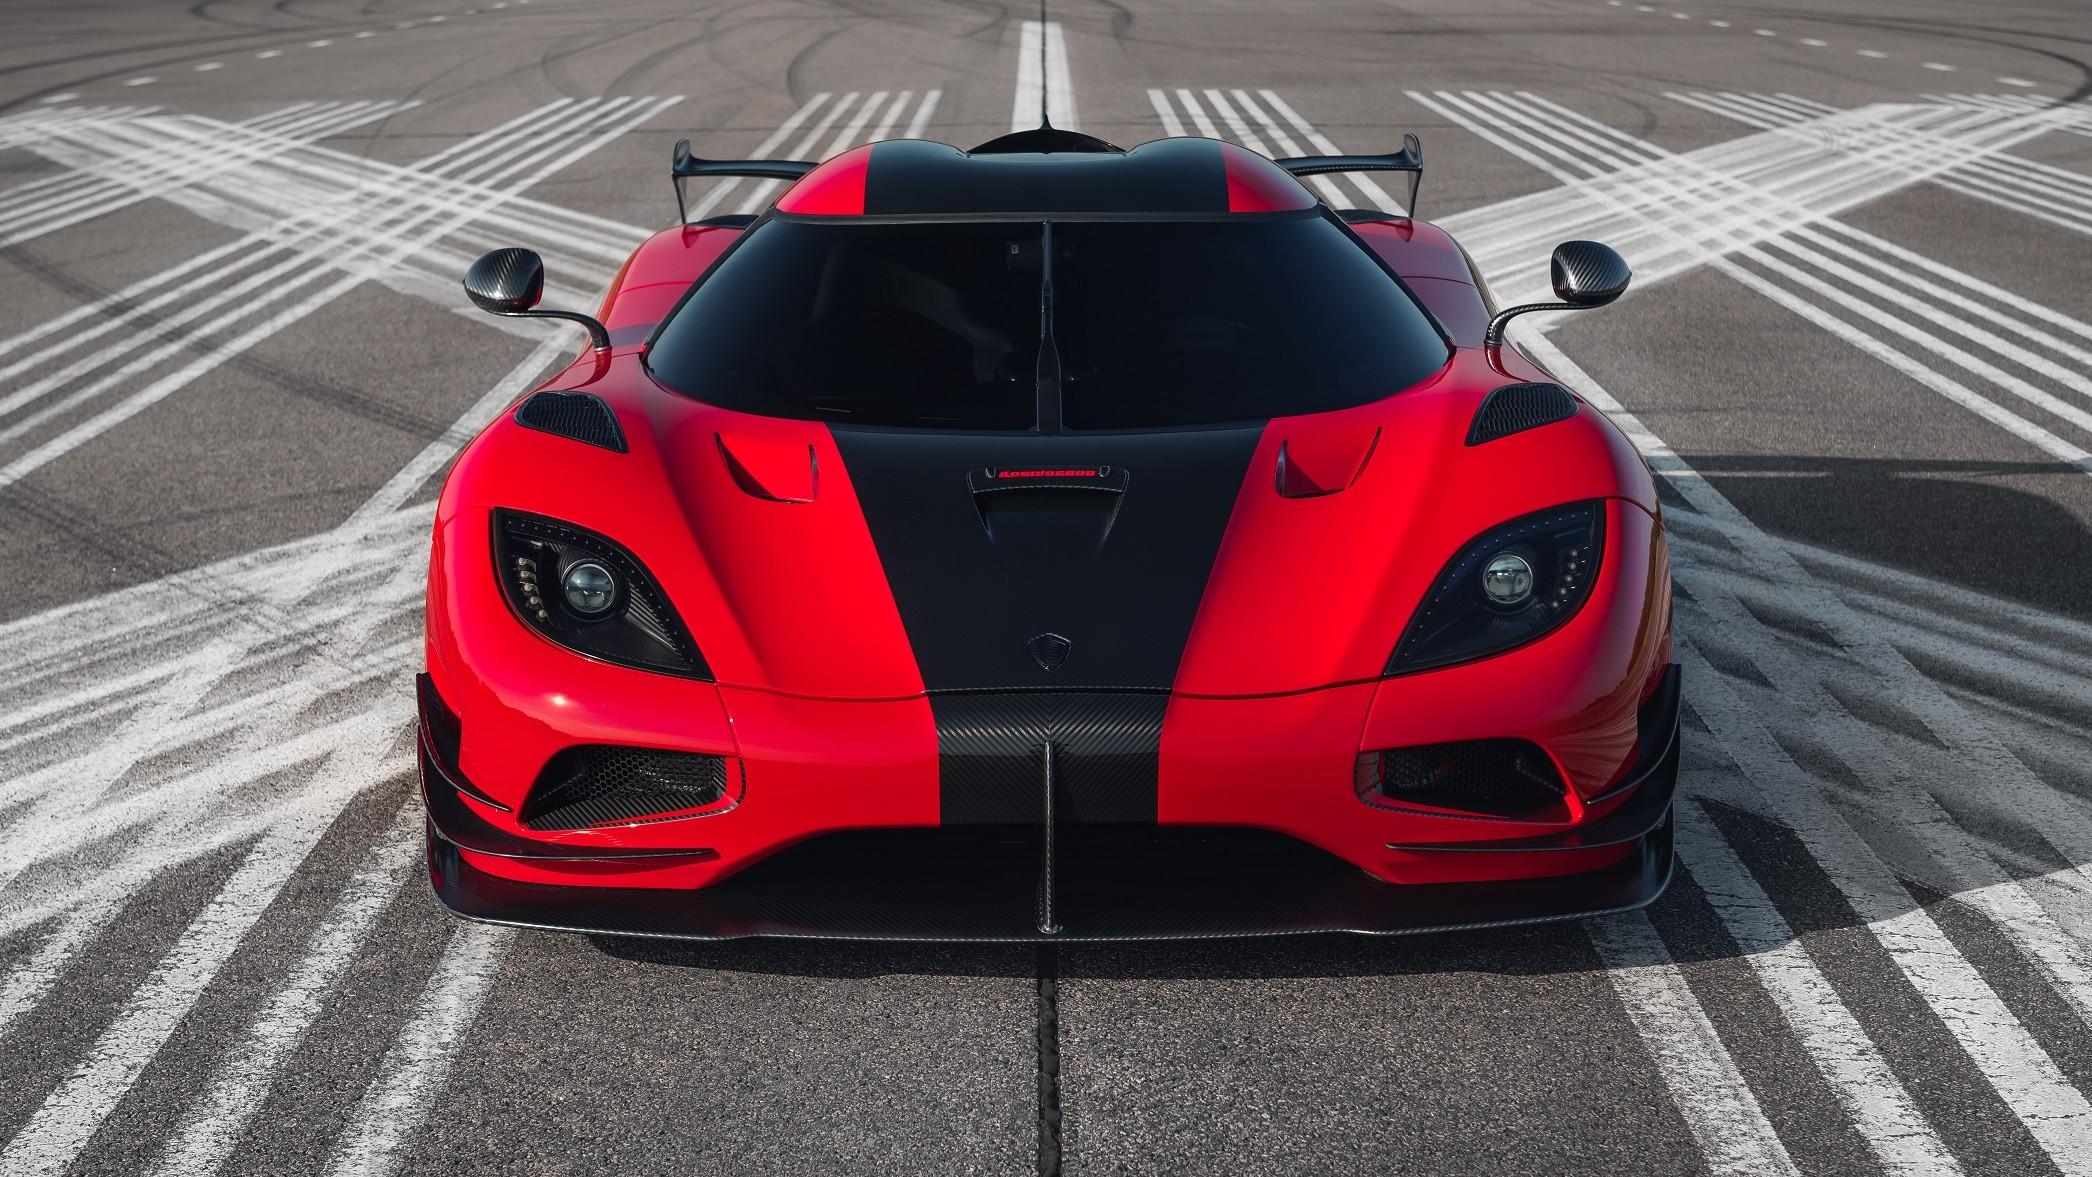 Koenisgegg: Δίνει νέα πνοή στο Agera RS